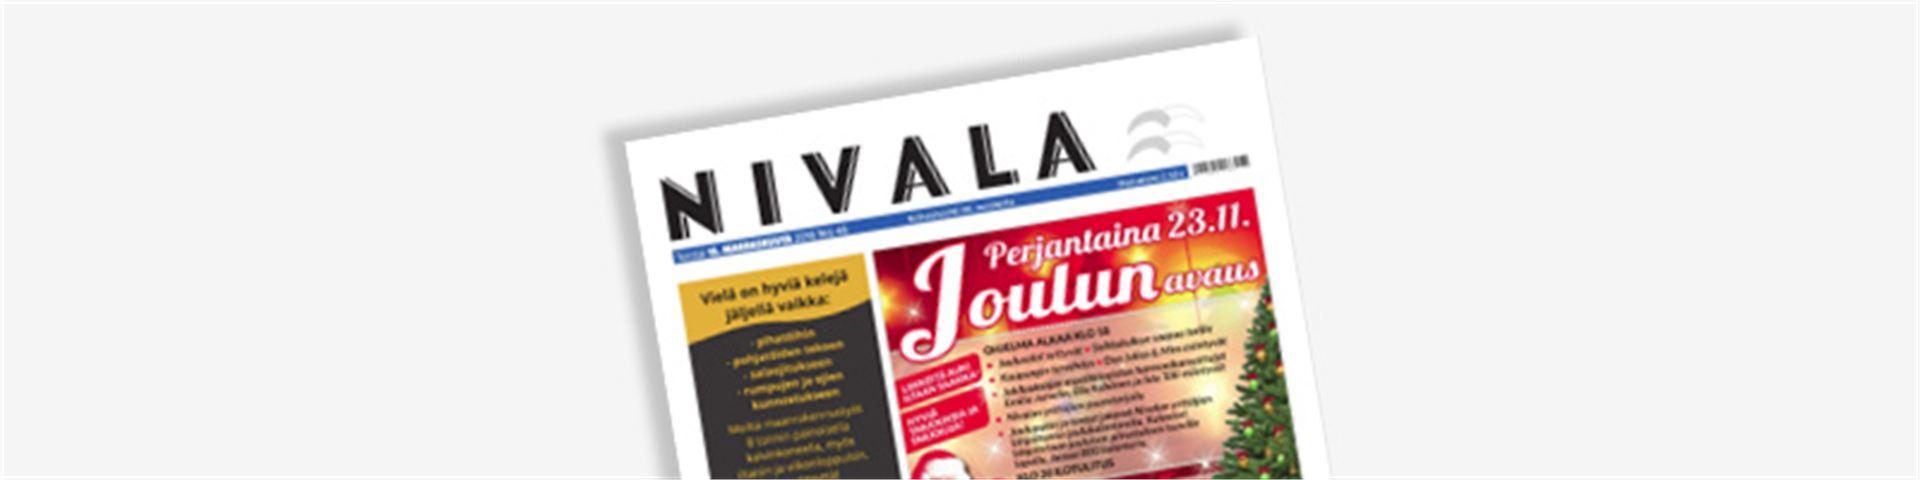 Nivala-lehti